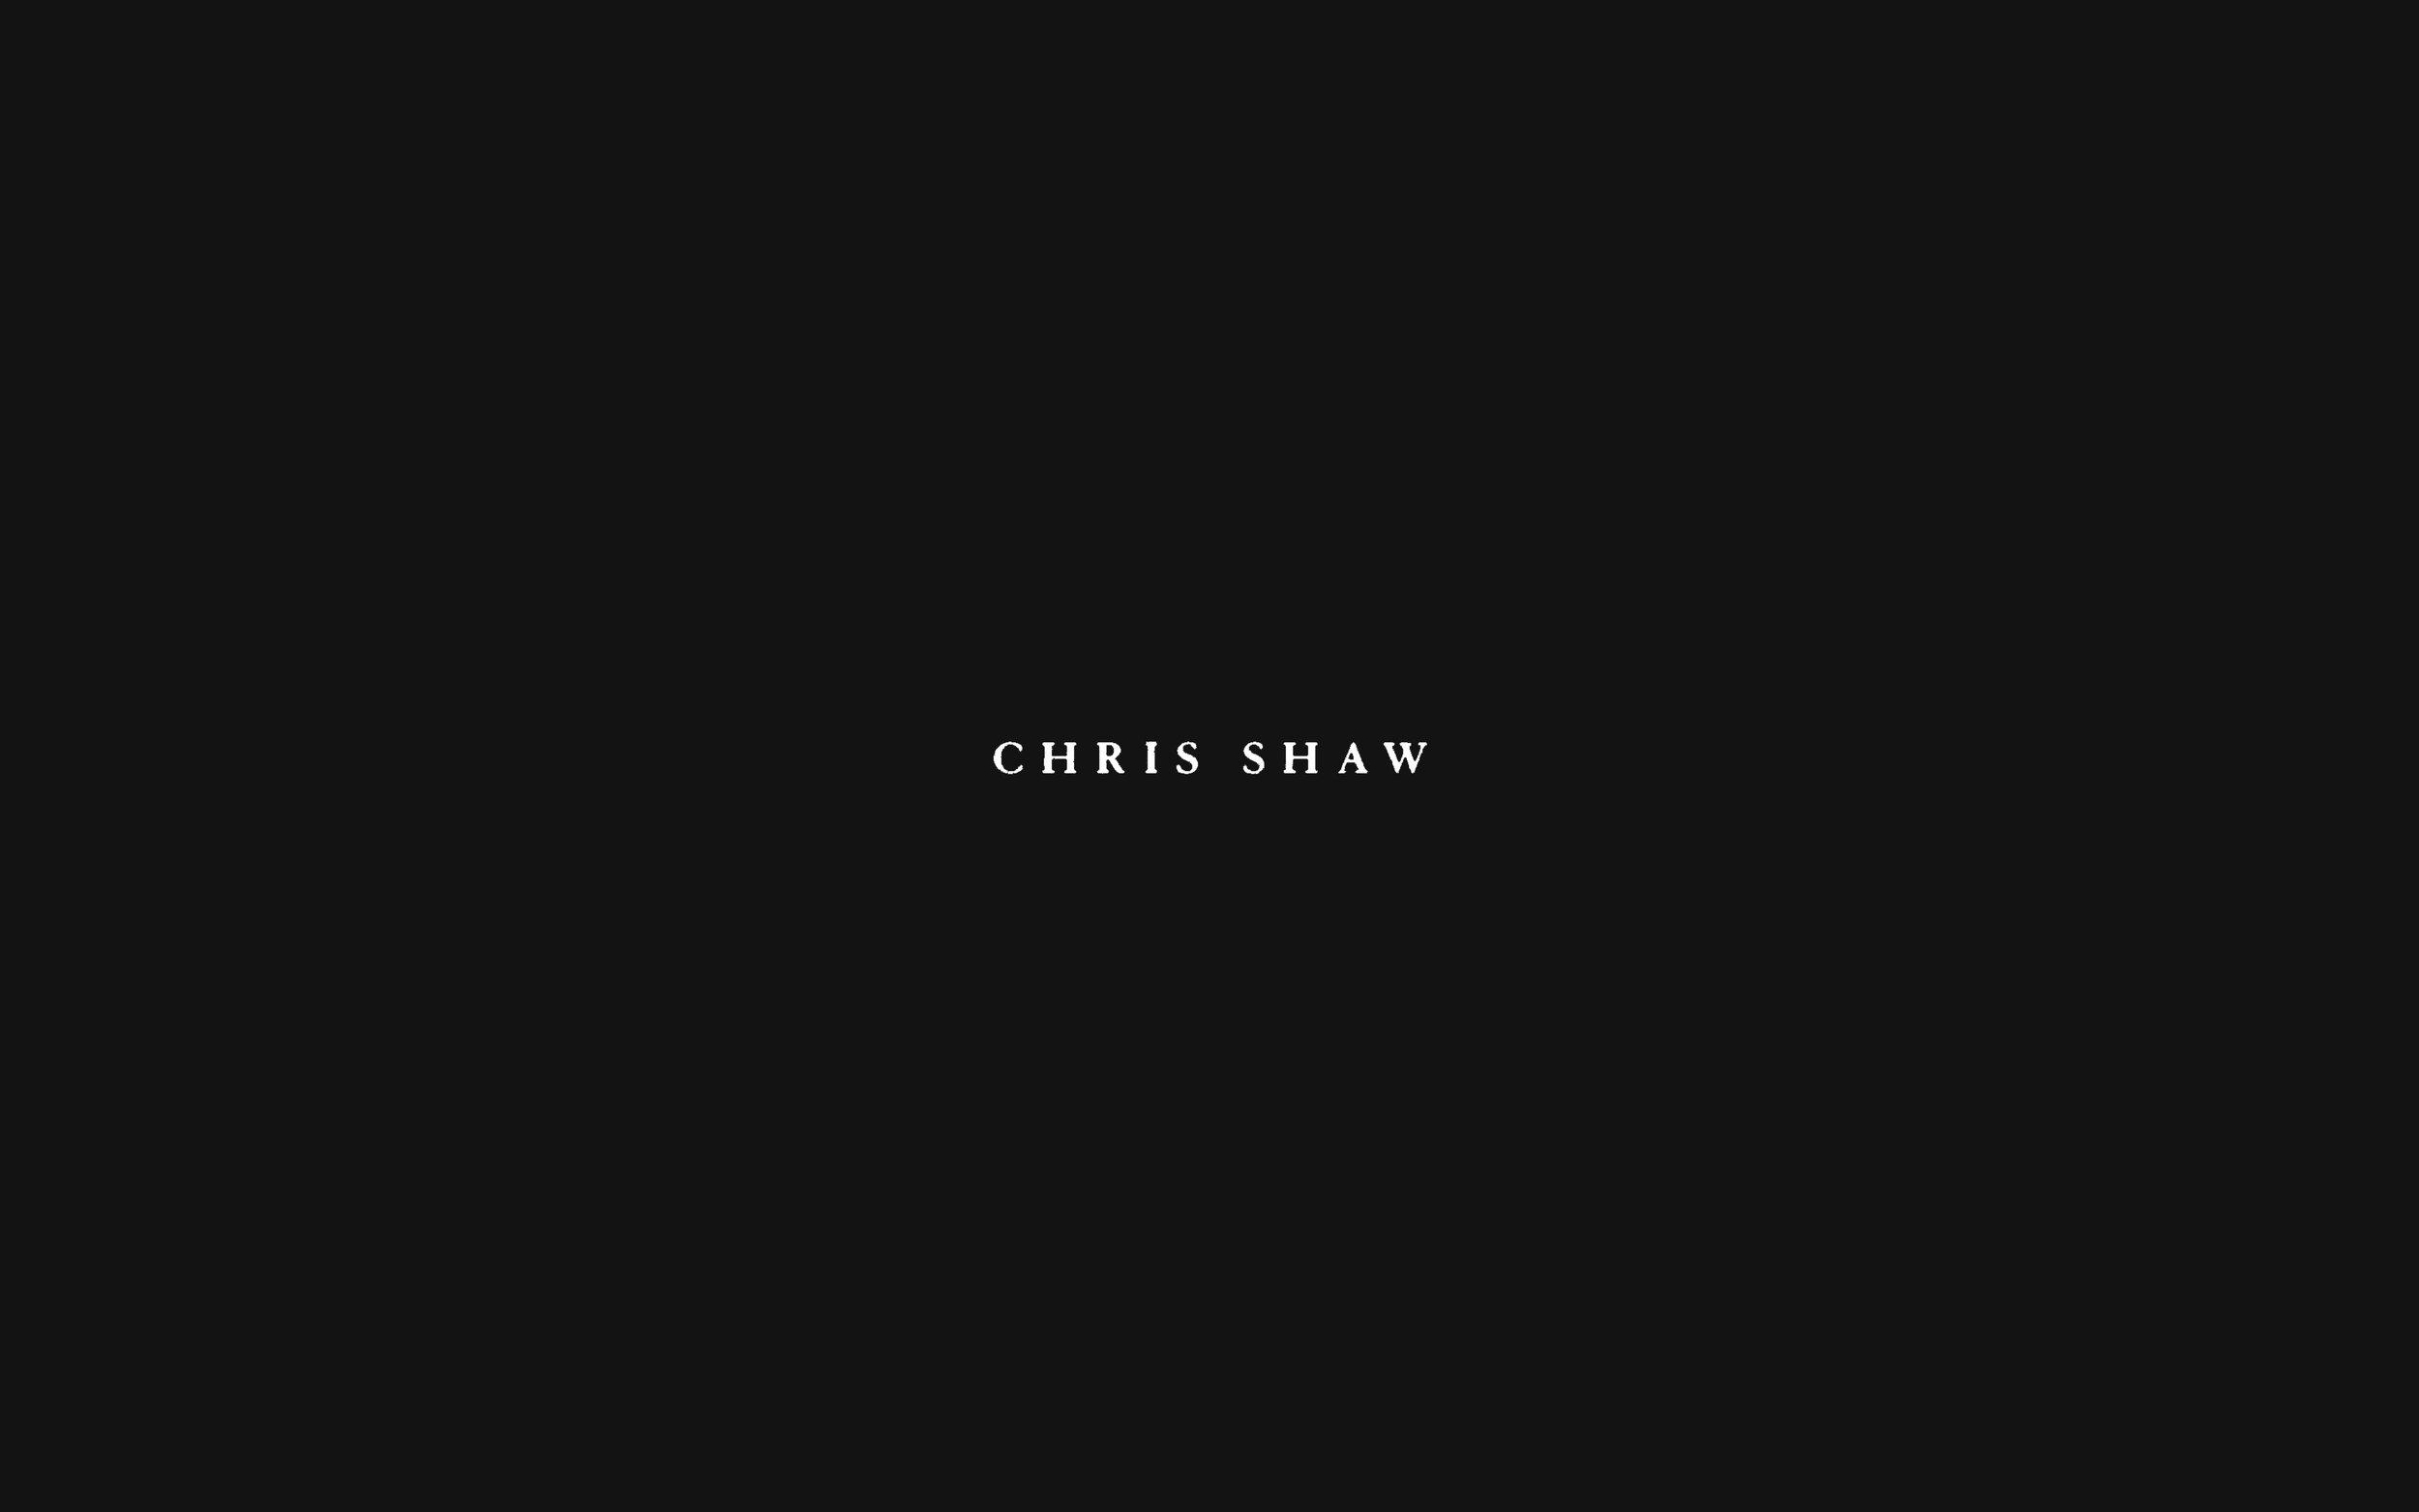 2D__Chris_Shaw_00.jpg